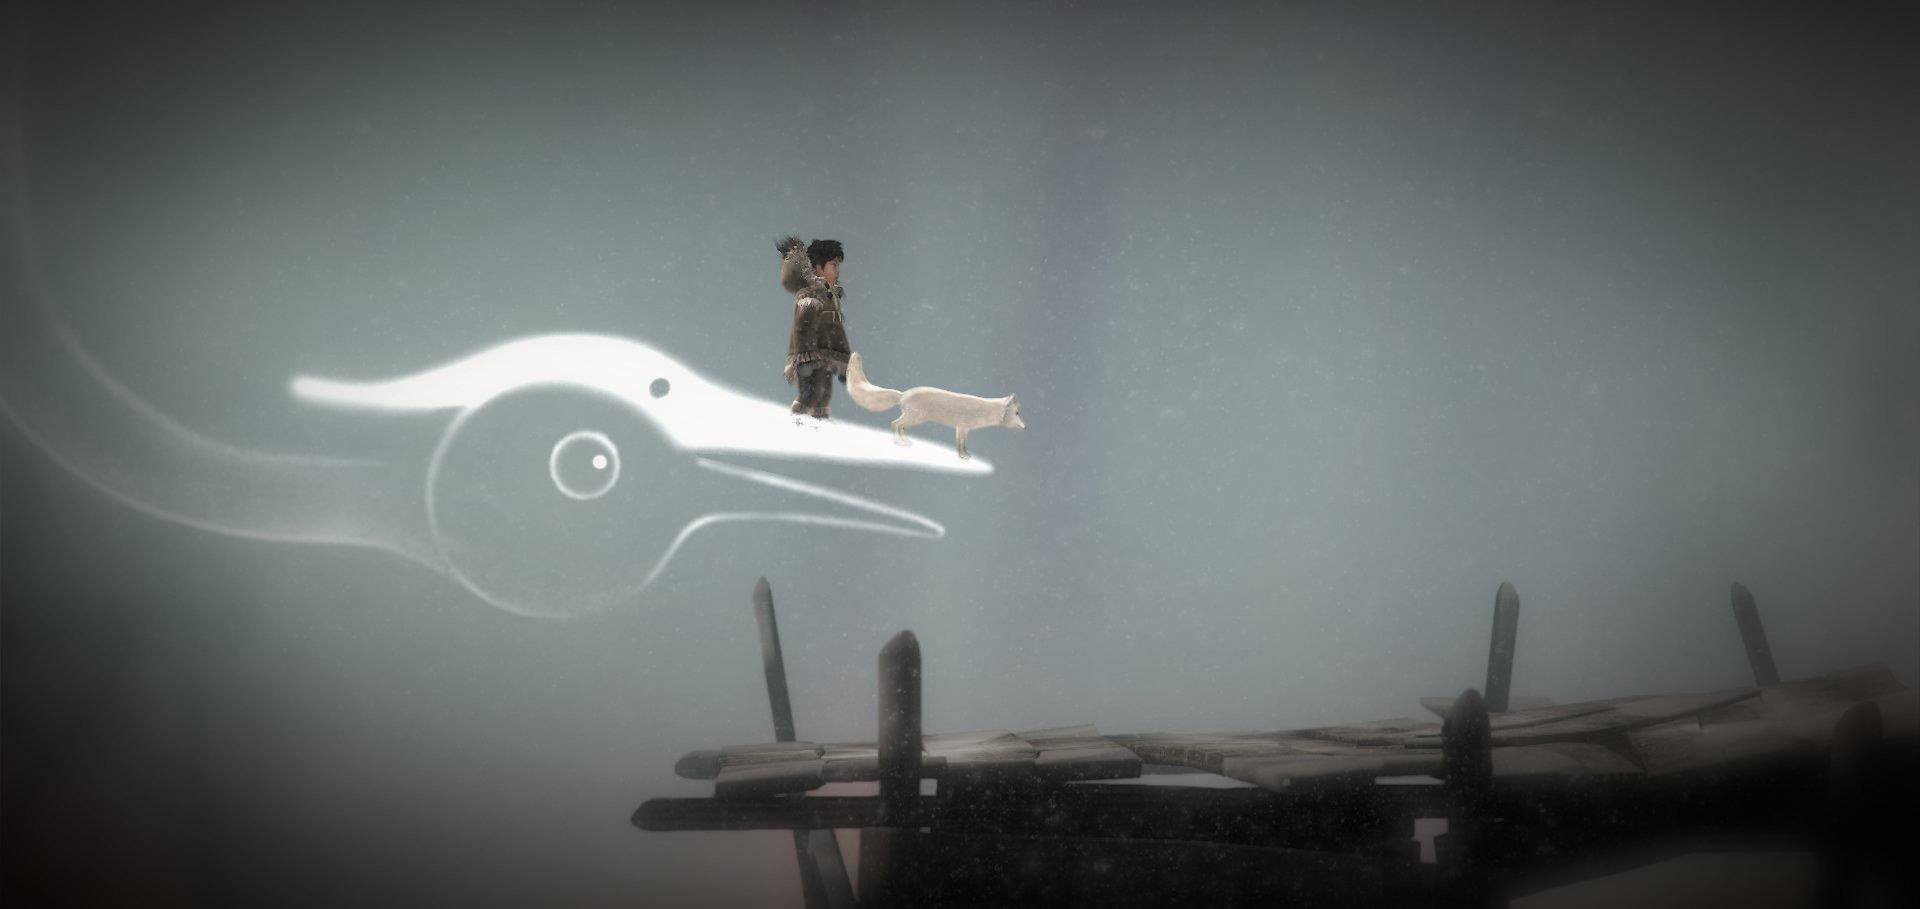 Never Alone - videogame screenshot - 2014